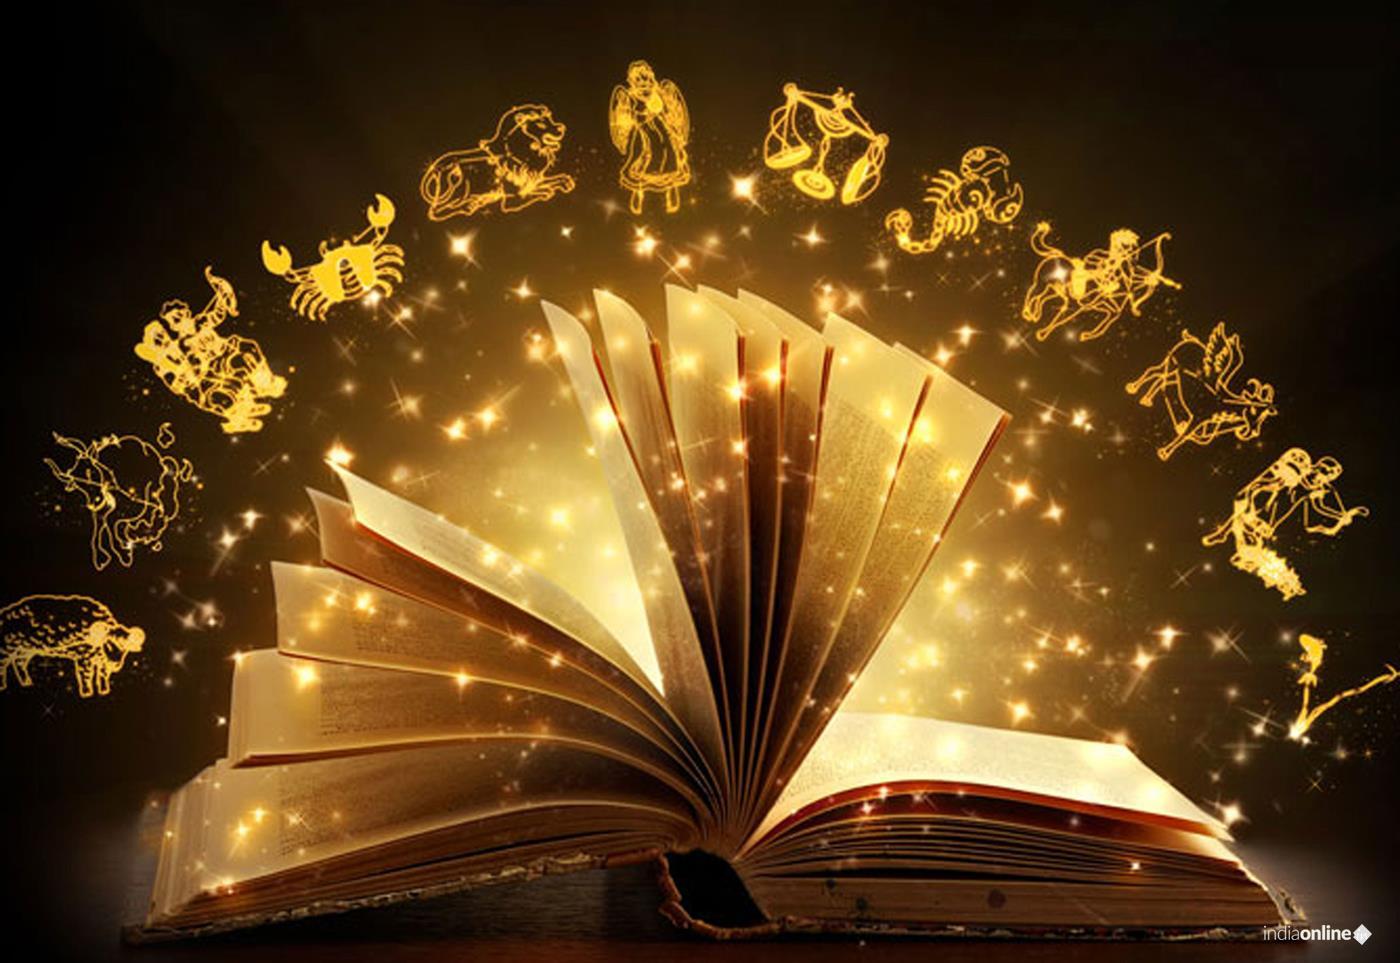 Притча: что прошептал Бог на ухо каждому знаку зодиака?